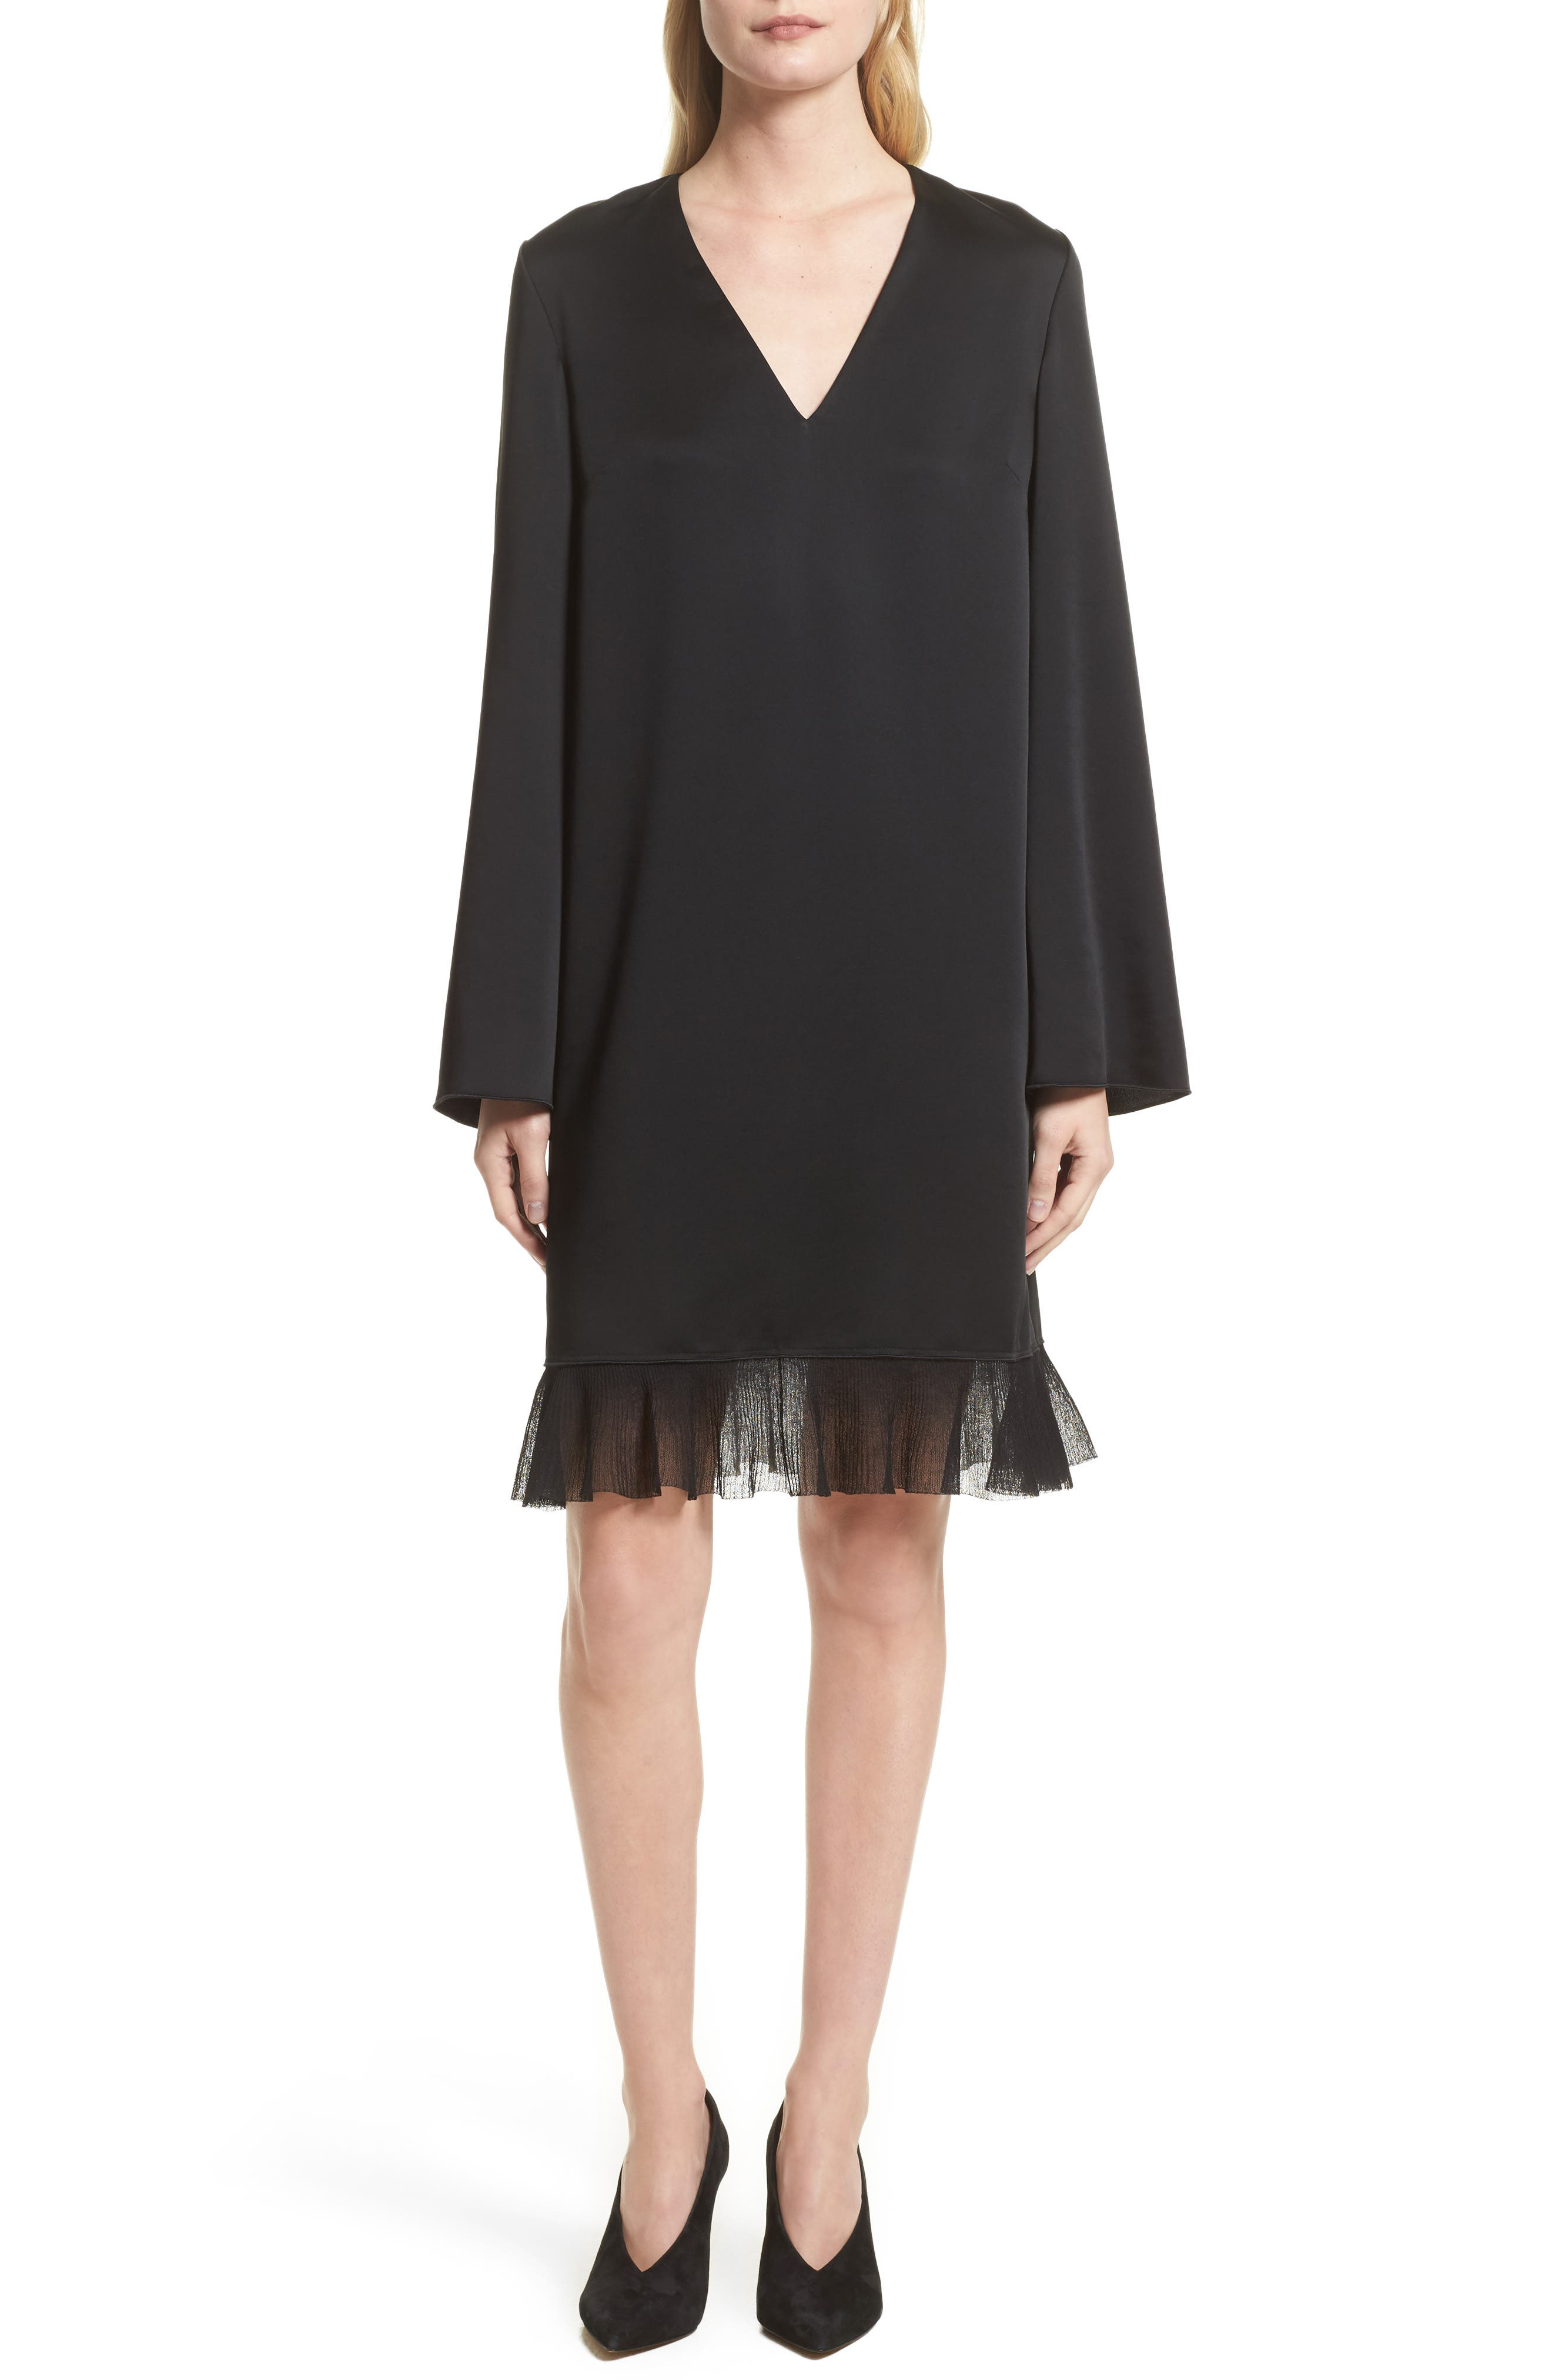 Heath Shift Dress,                             Main thumbnail 1, color,                             Black